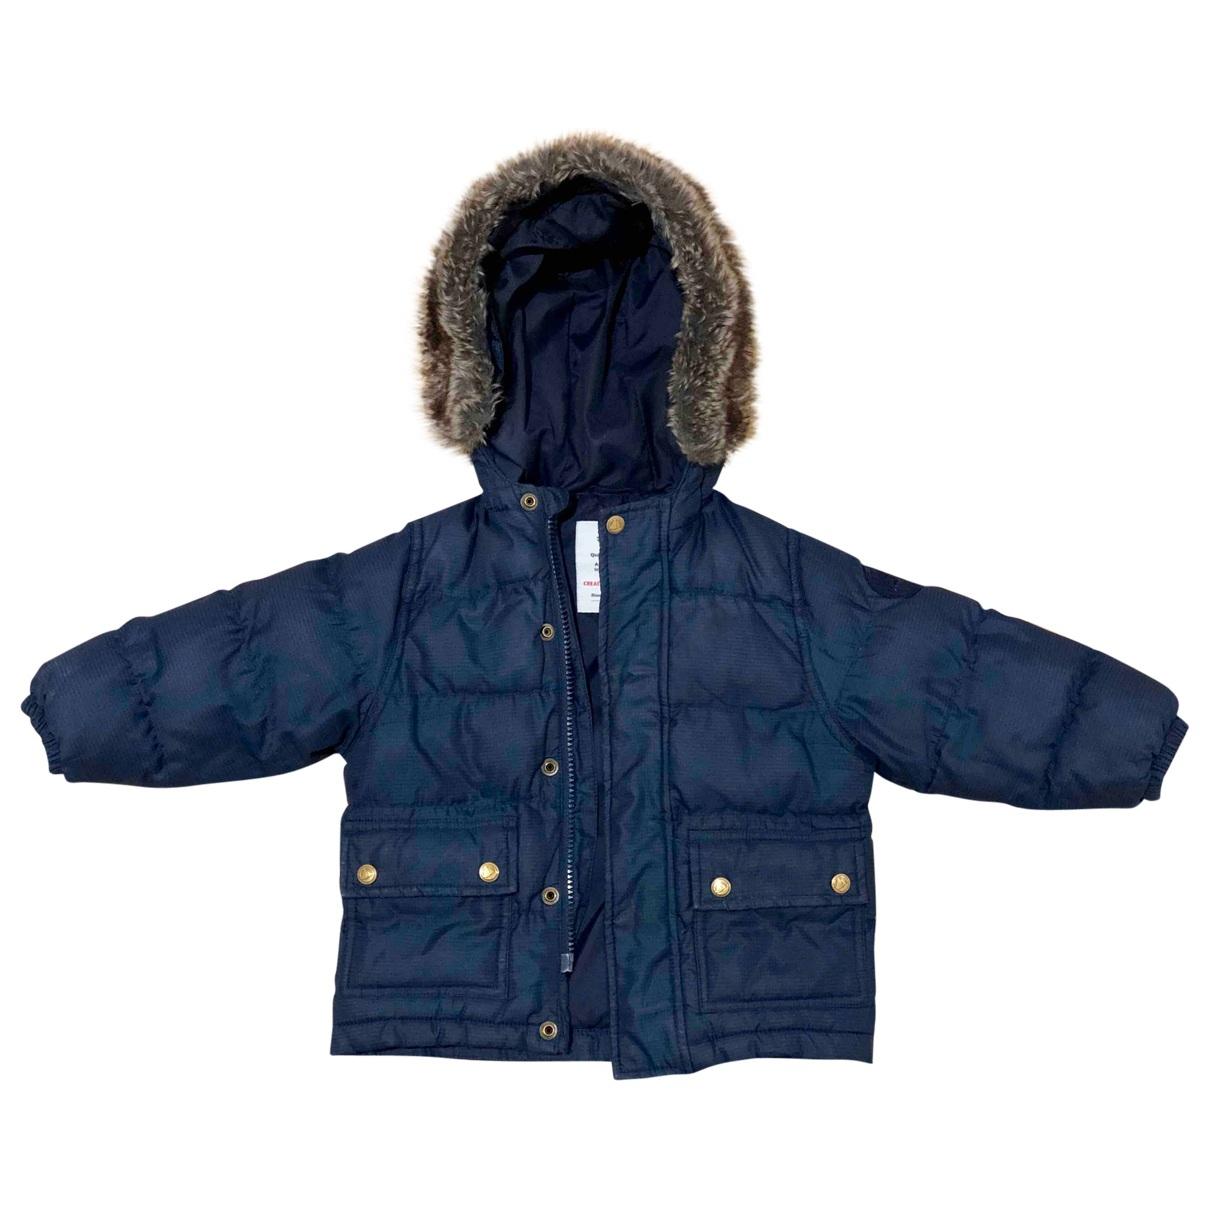 Petit Bateau \N Navy jacket & coat for Kids 18 months - up to 81cm FR